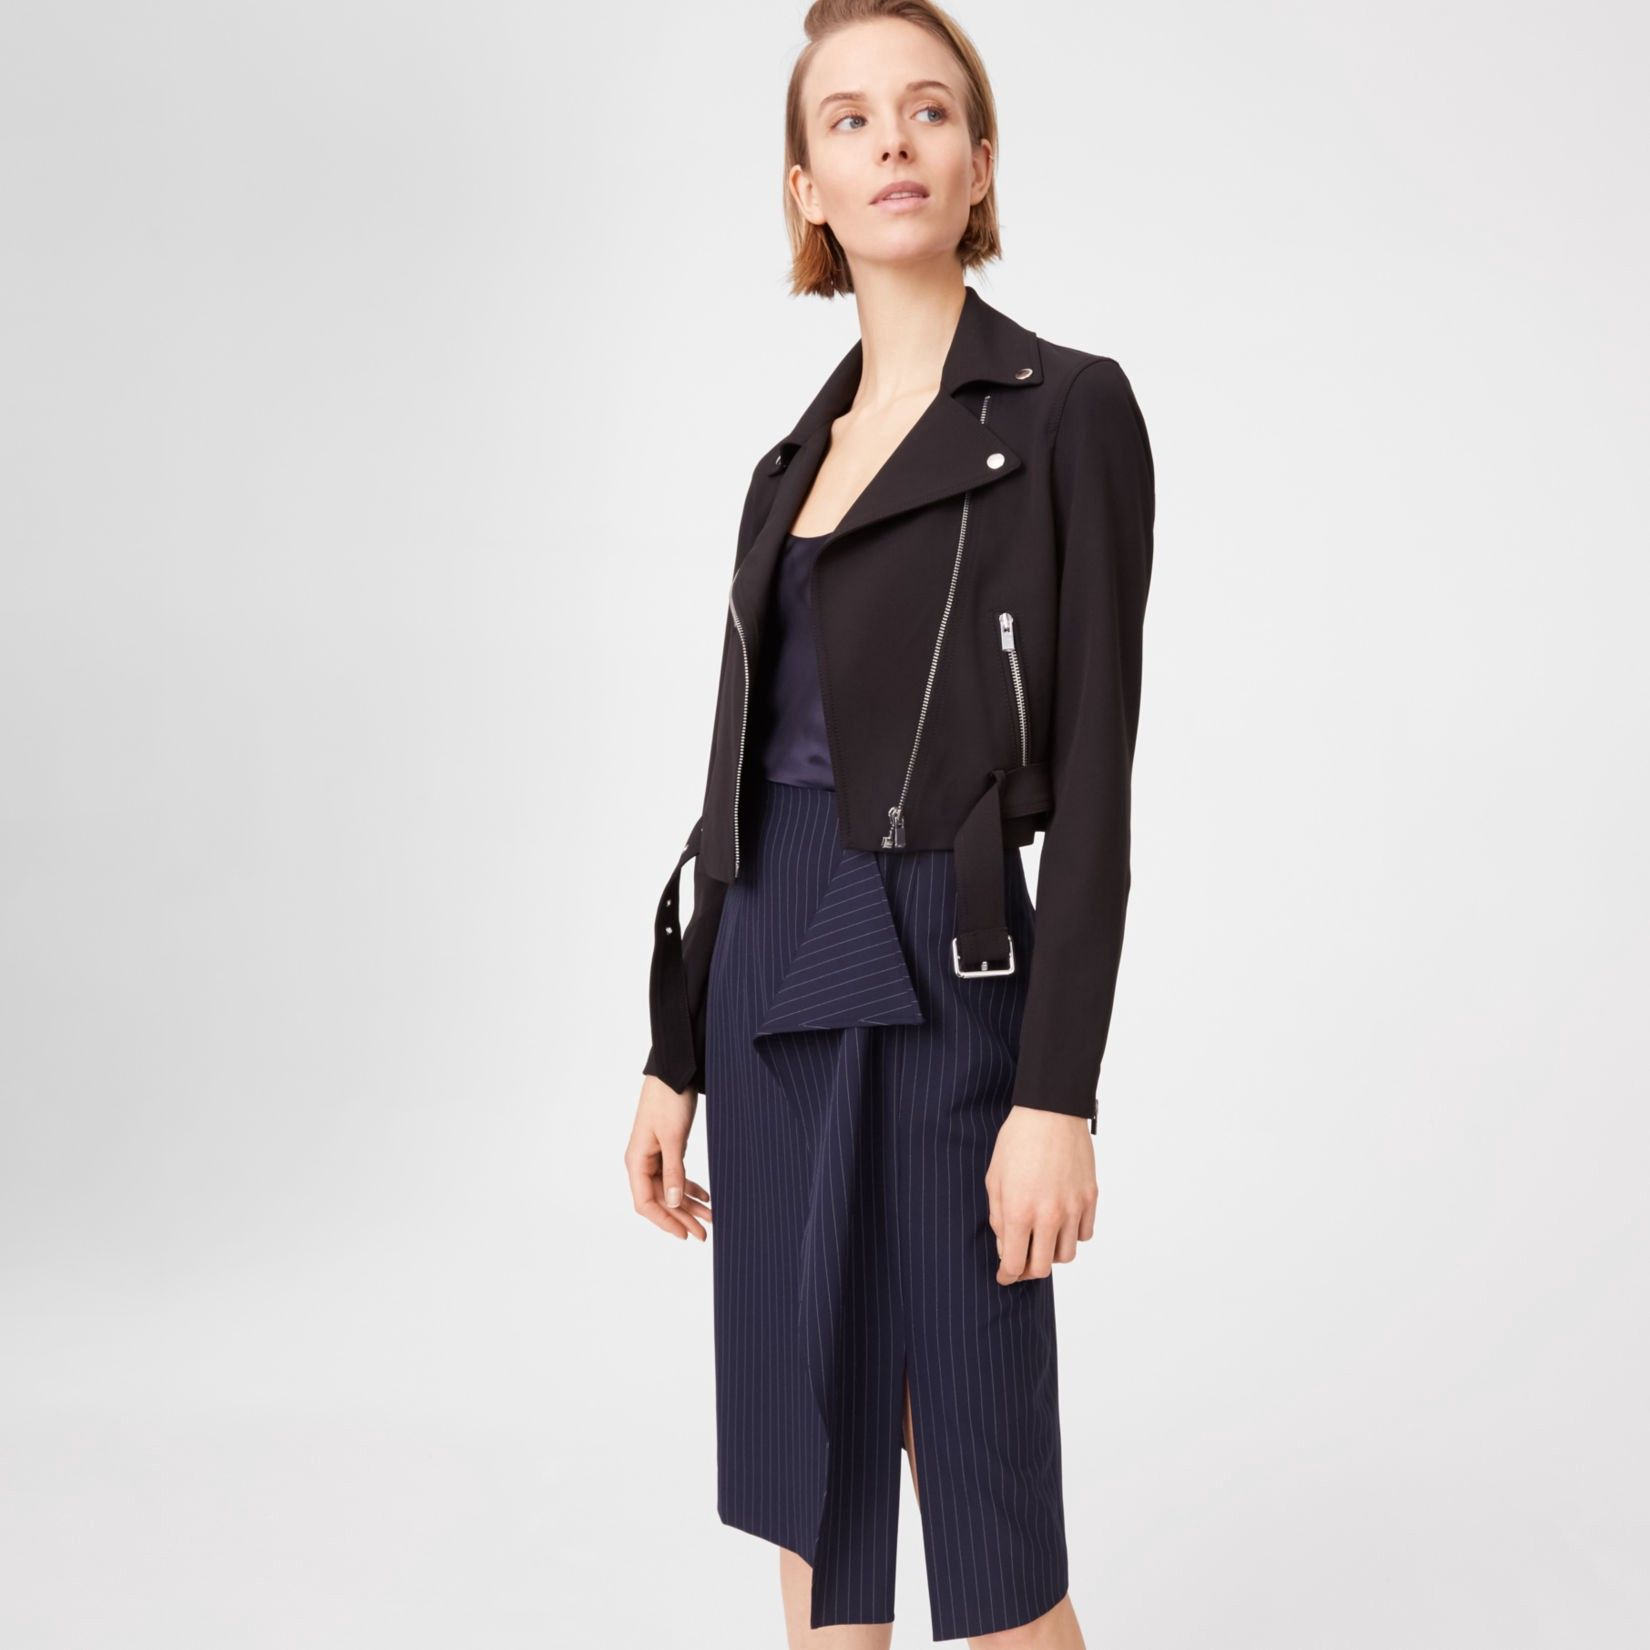 Lacarrah jacket club monaco products jackets how to wear jpg 1650x1650 Club  monaco moto jacket 85f87995b